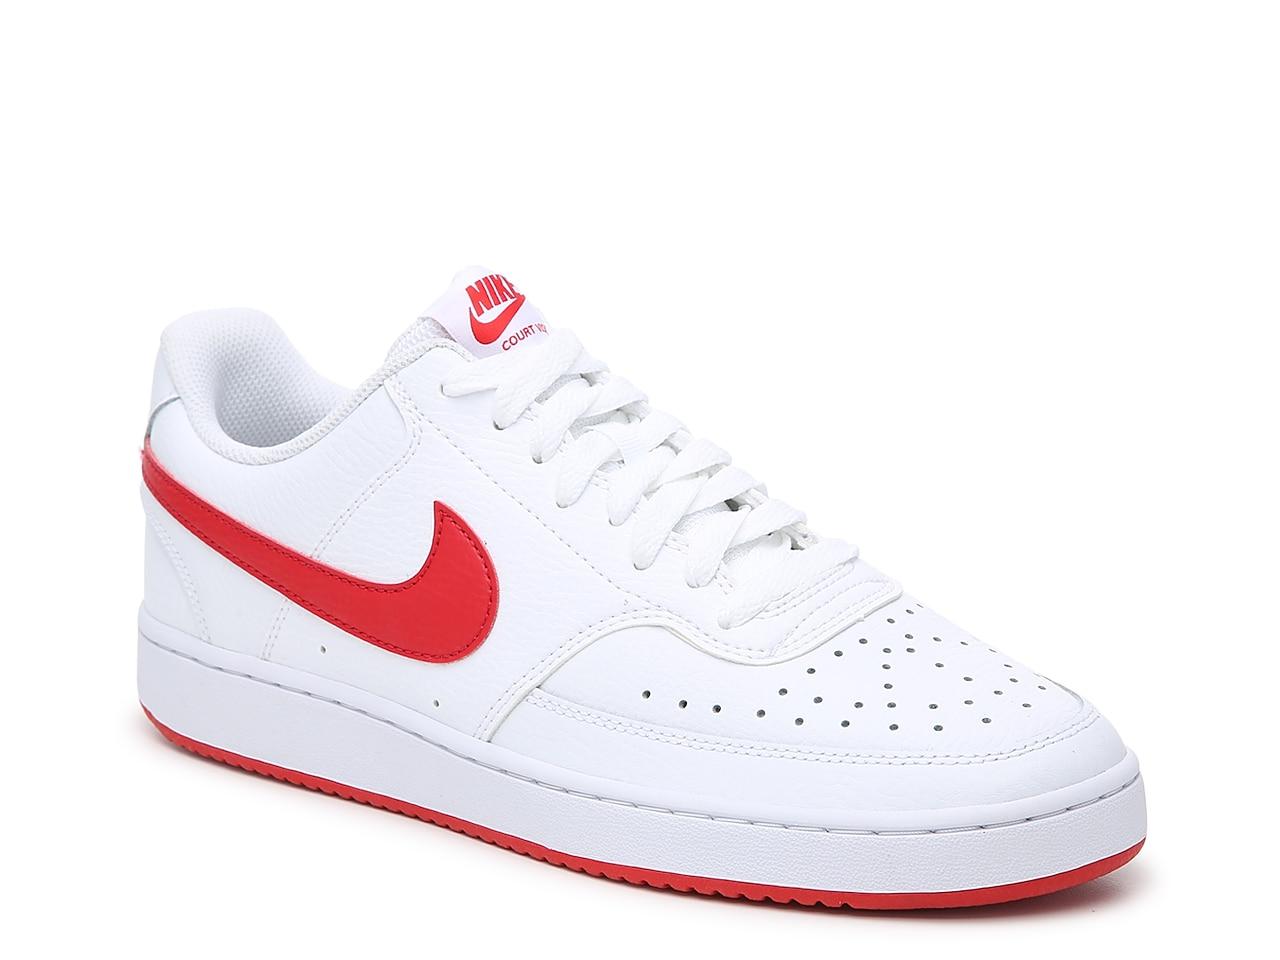 Nike Court Vision Low Basketball Shoe - Men's